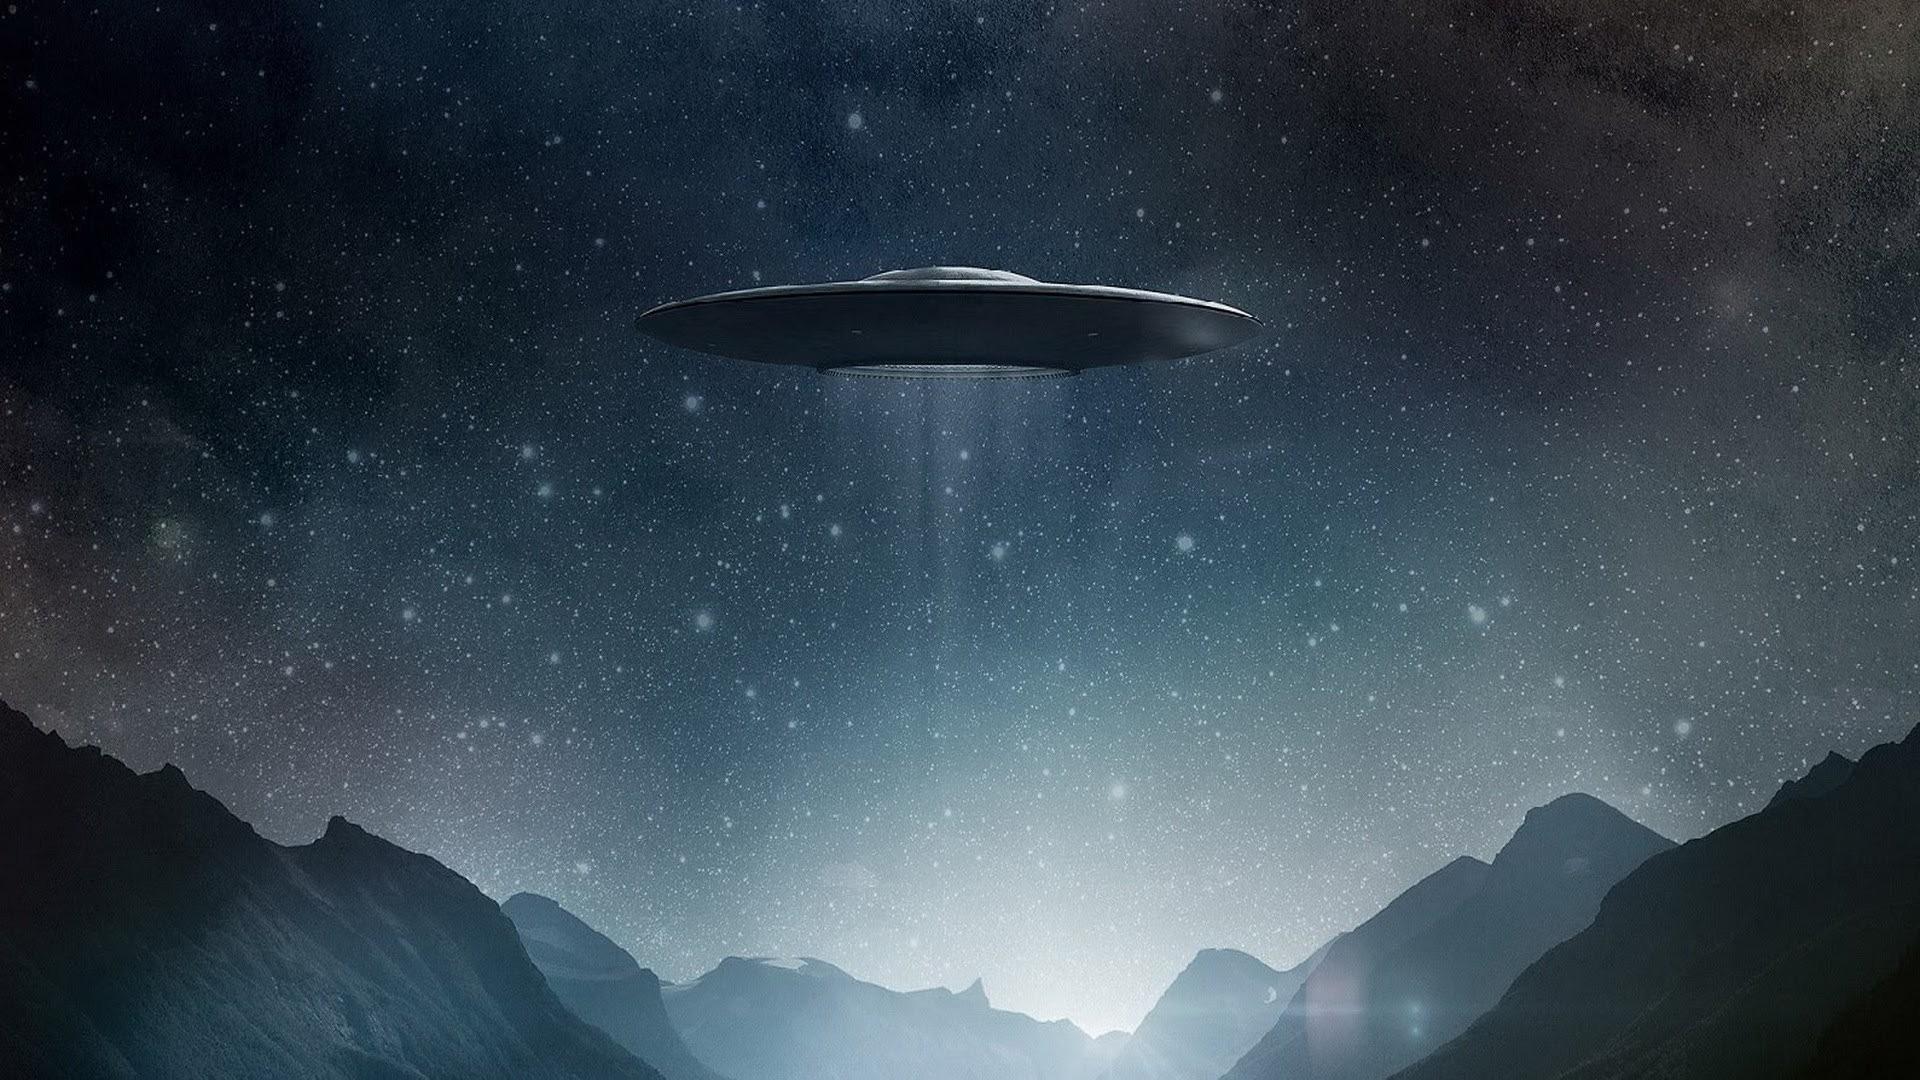 Ufo Desktop Wallpaper